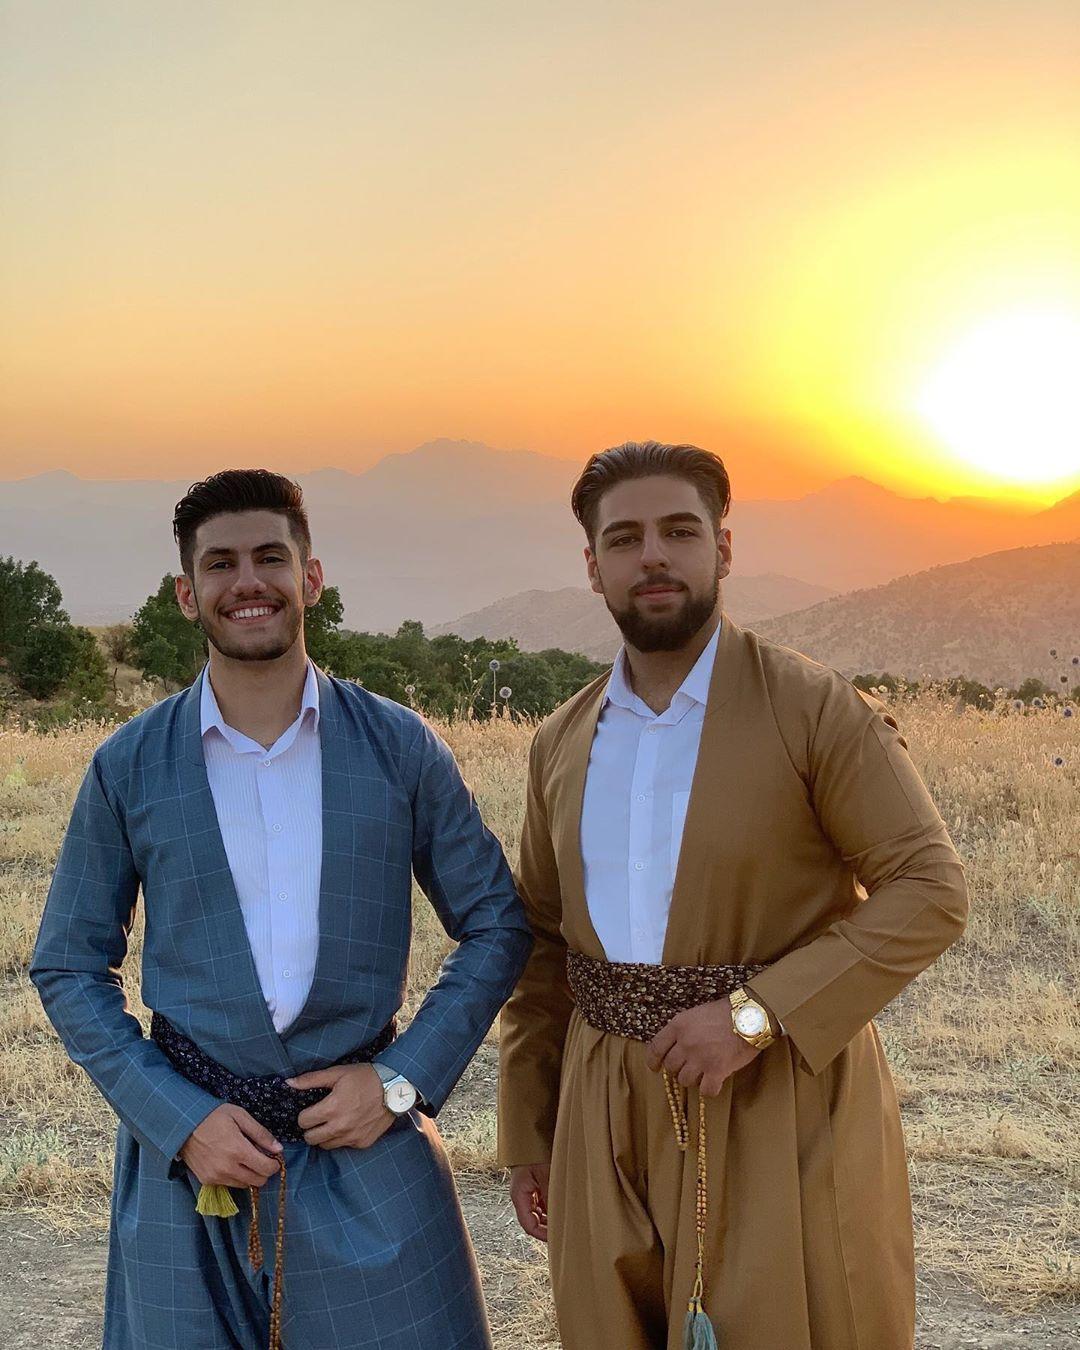 Amoza ❤️🦁 . . . . #kurdishclothes##kurdistan#slemani#original